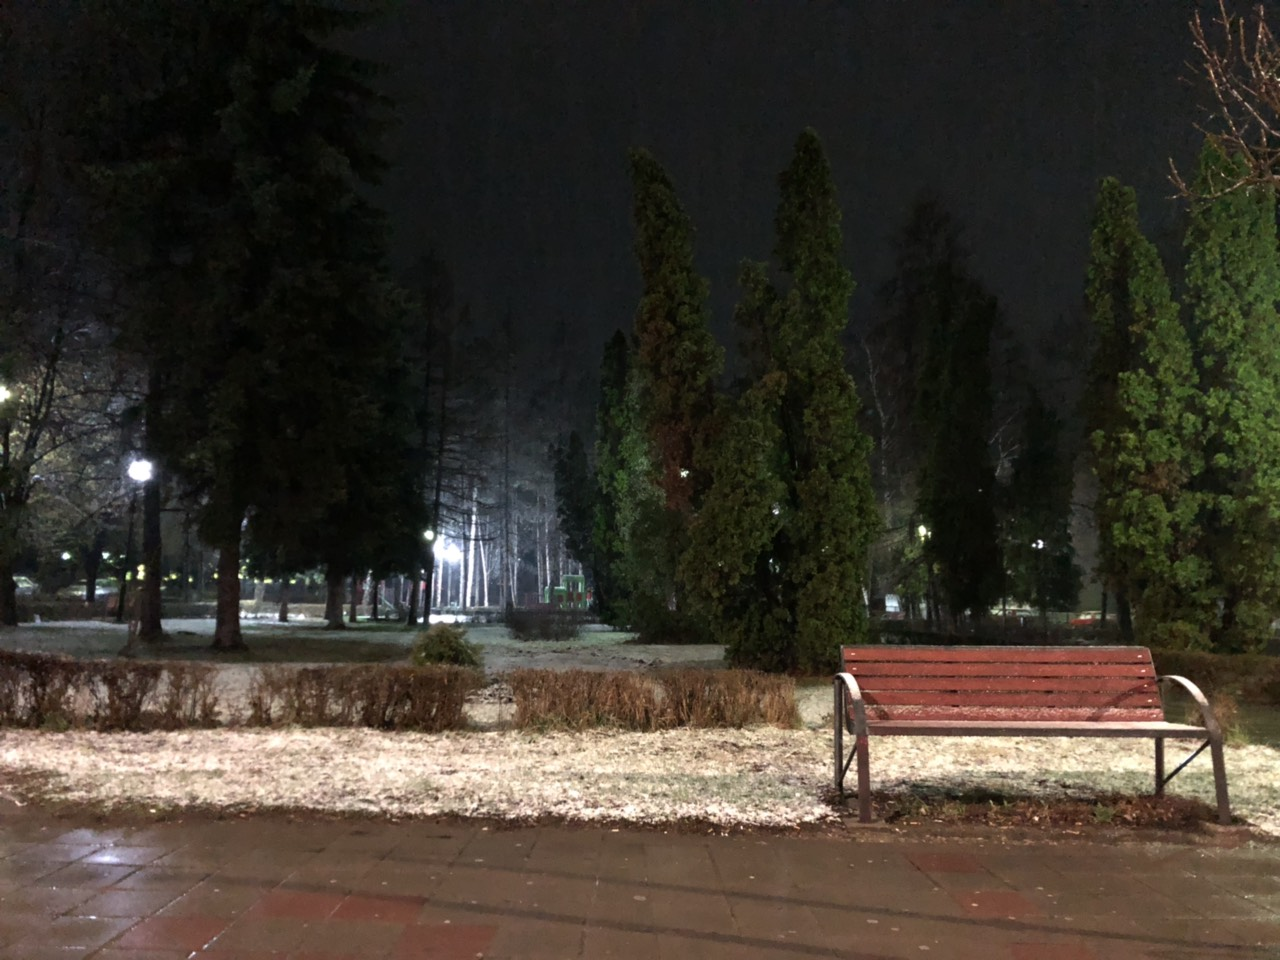 Sneg u martu, gradski park, foto: S.M.